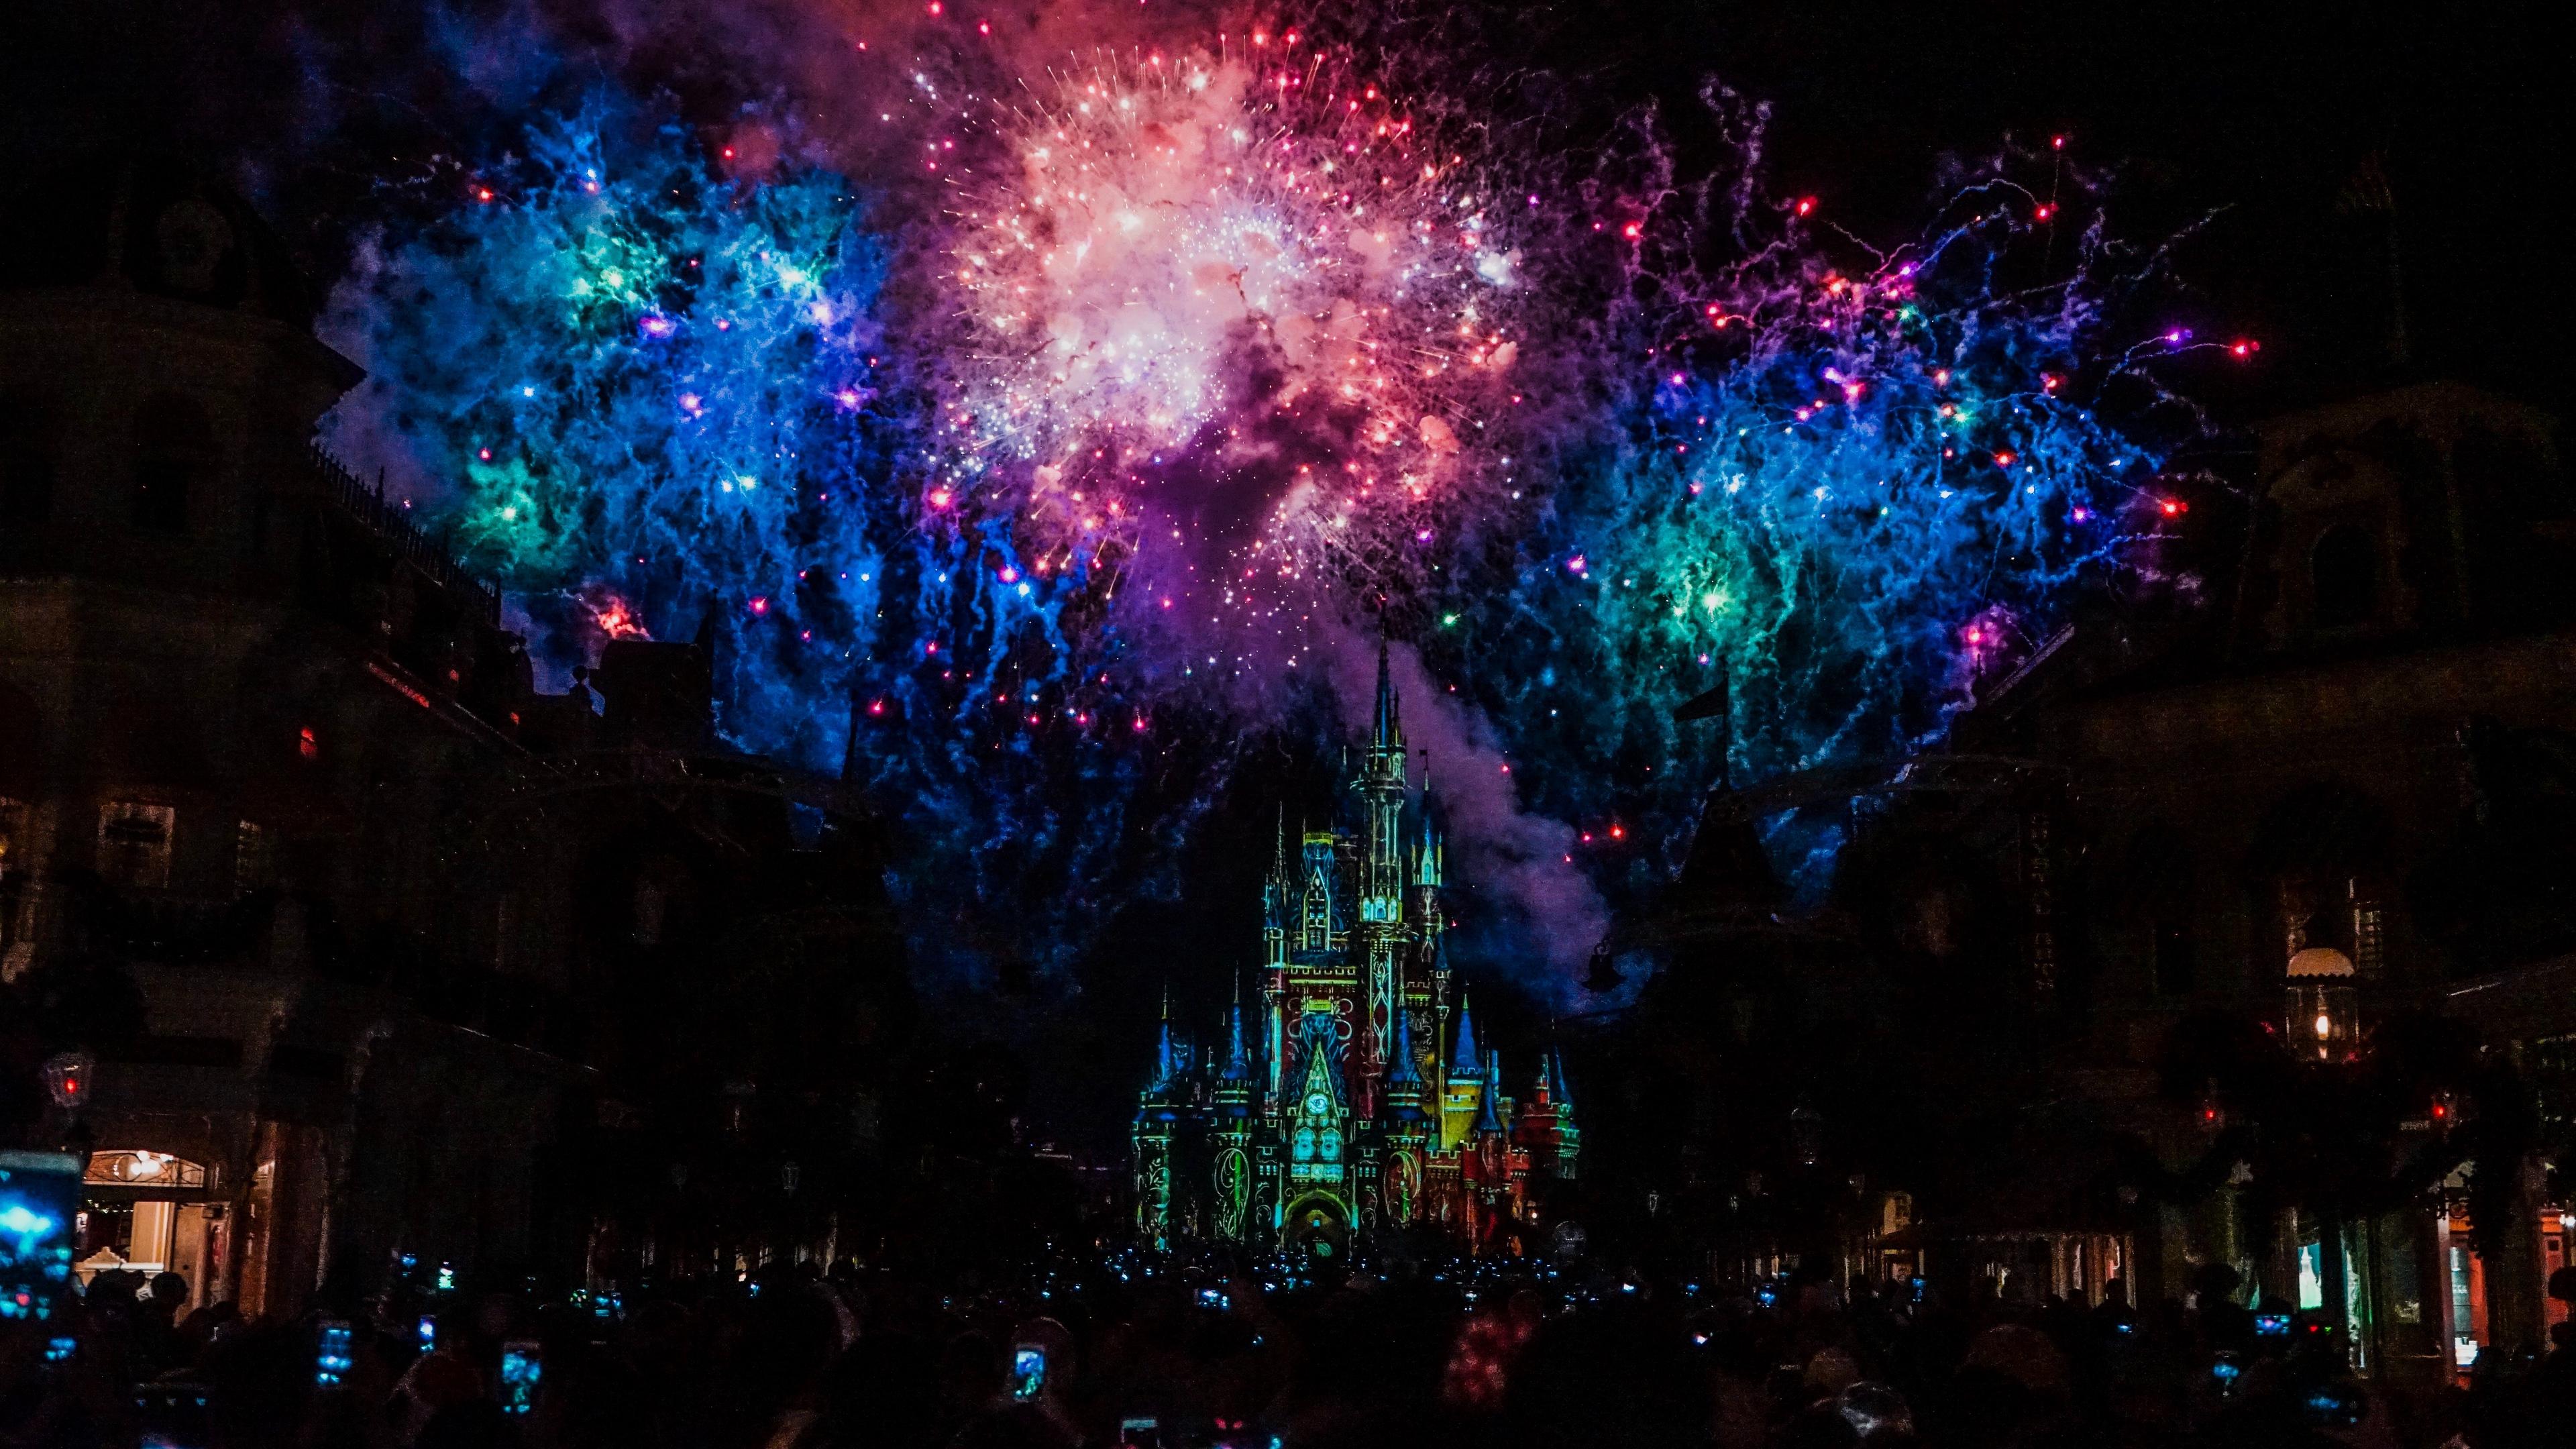 salute castle holiday colorful 4k 1538344569 - salute, castle, holiday, colorful 4k - salute, Holiday, Castle